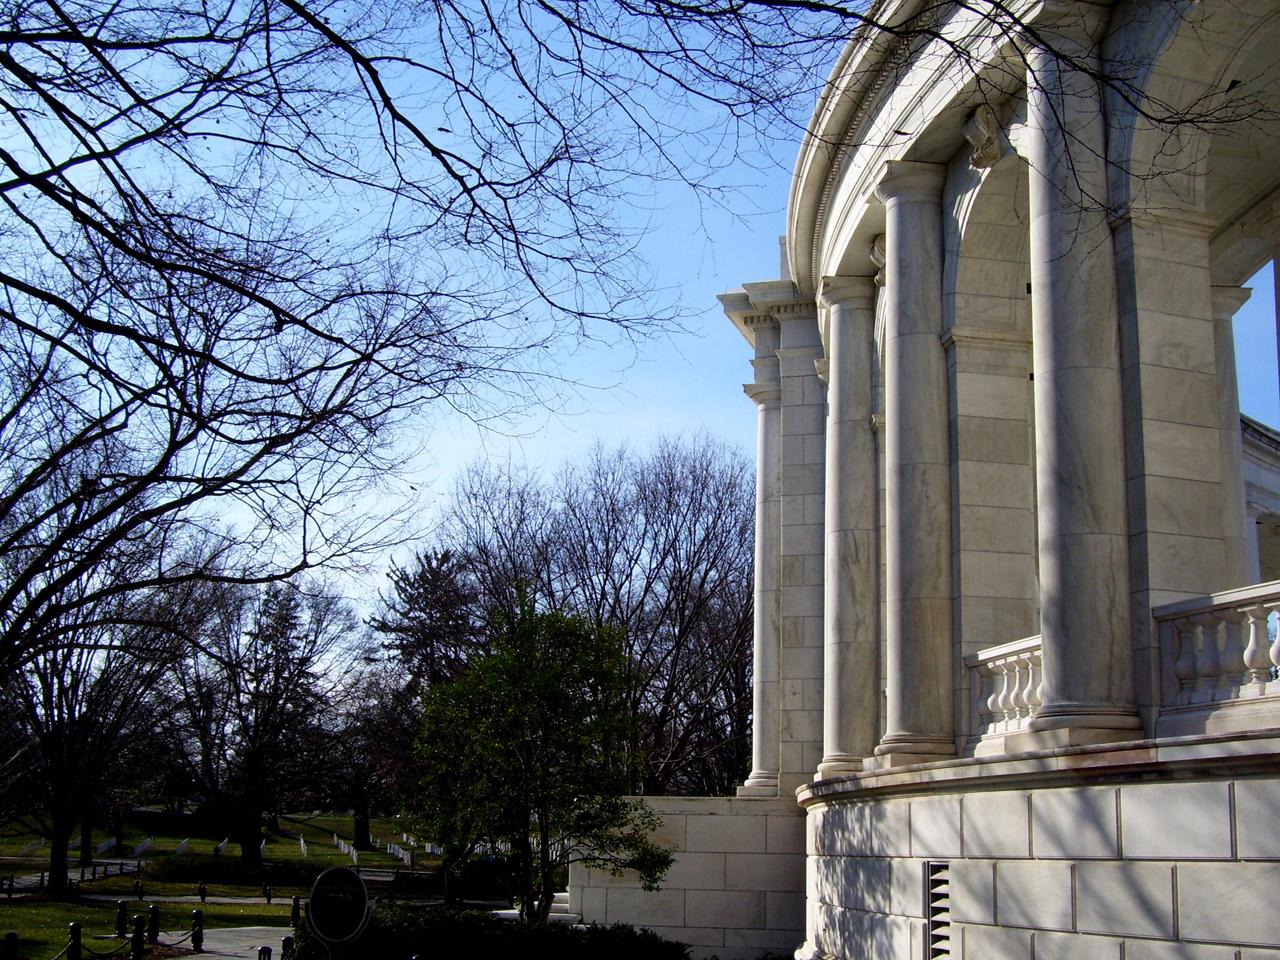 Mount Liberty College